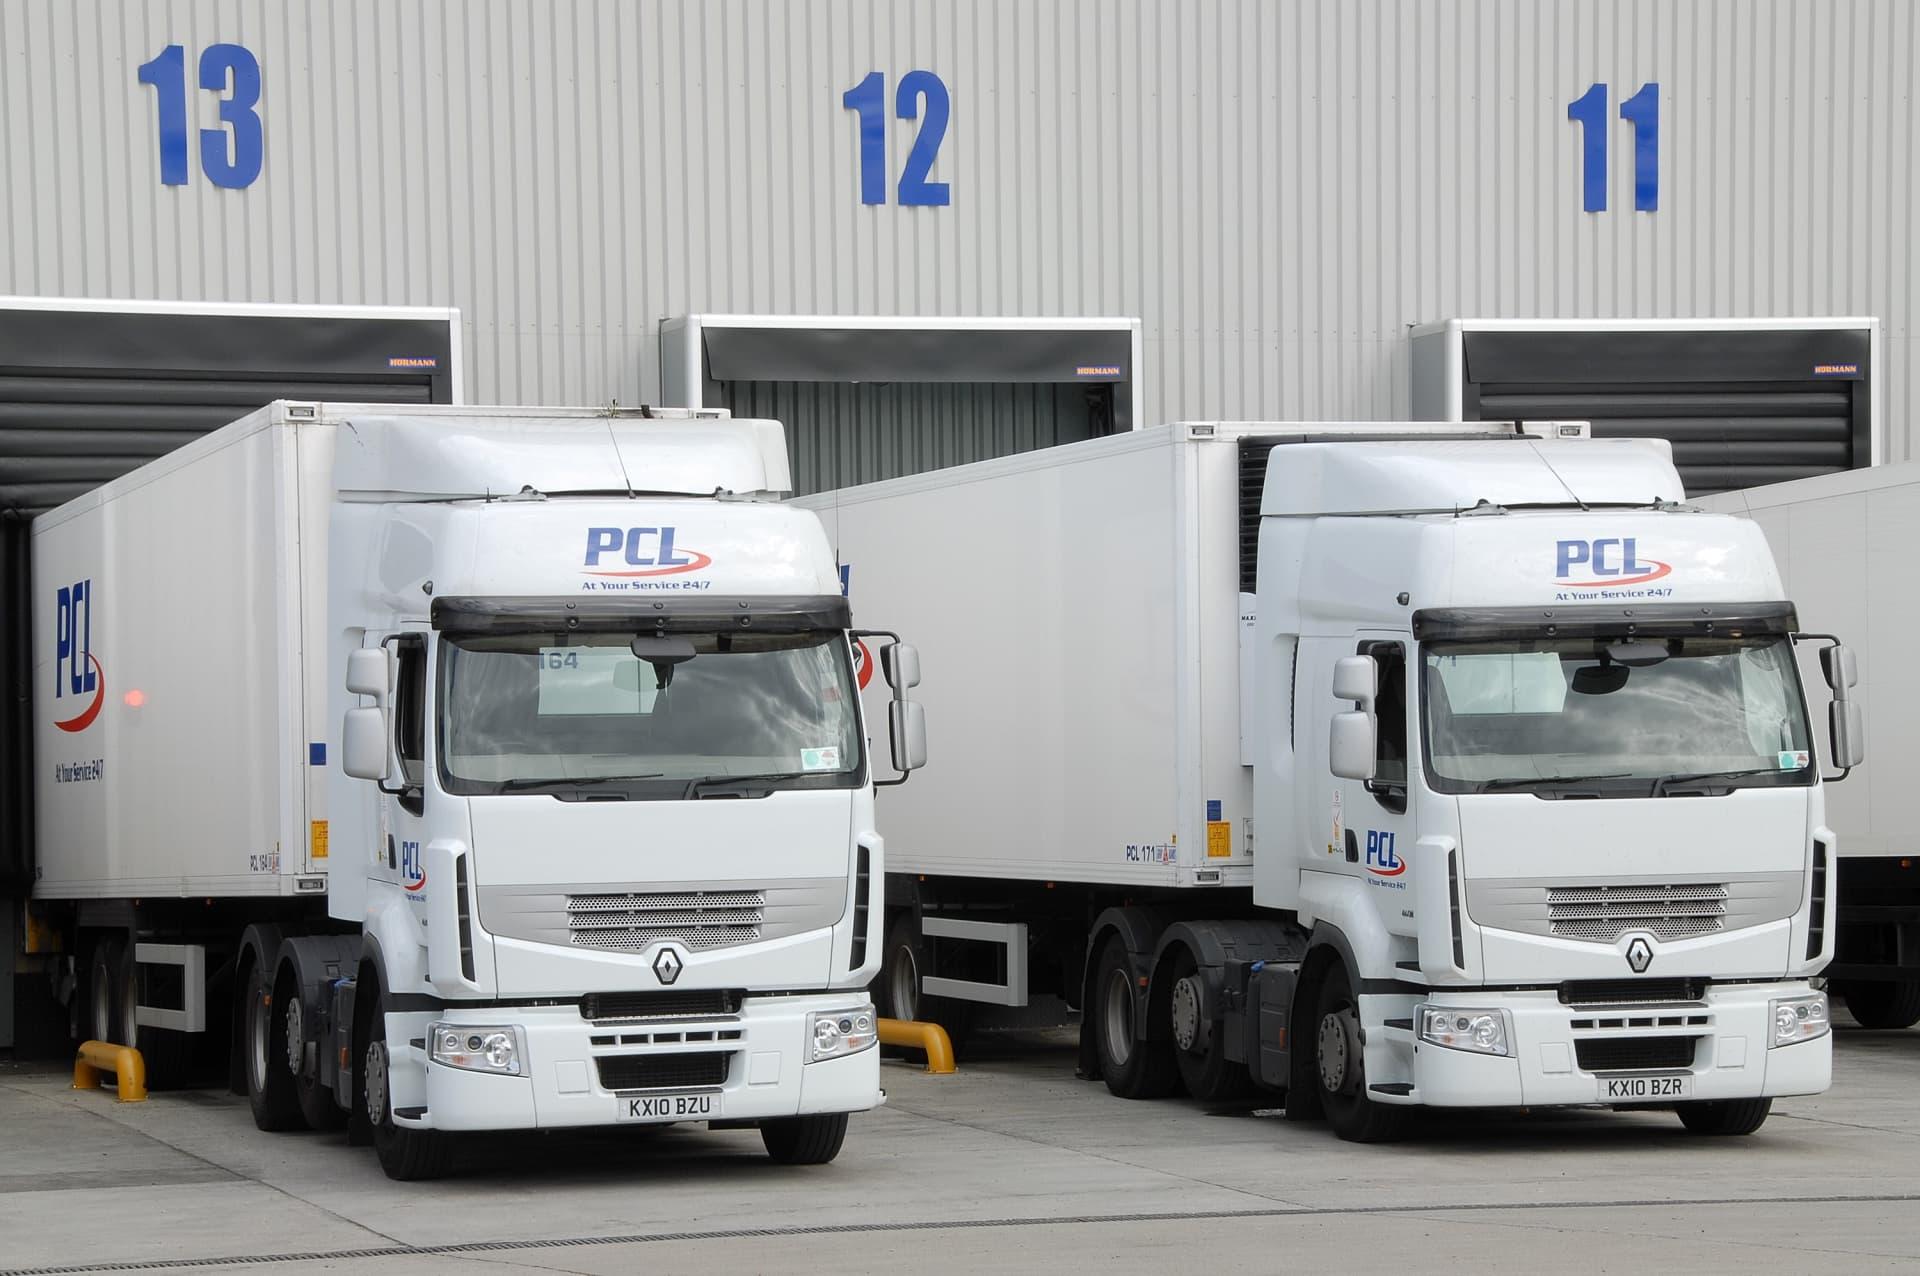 Fin Camiones Diesel 2040 Renual